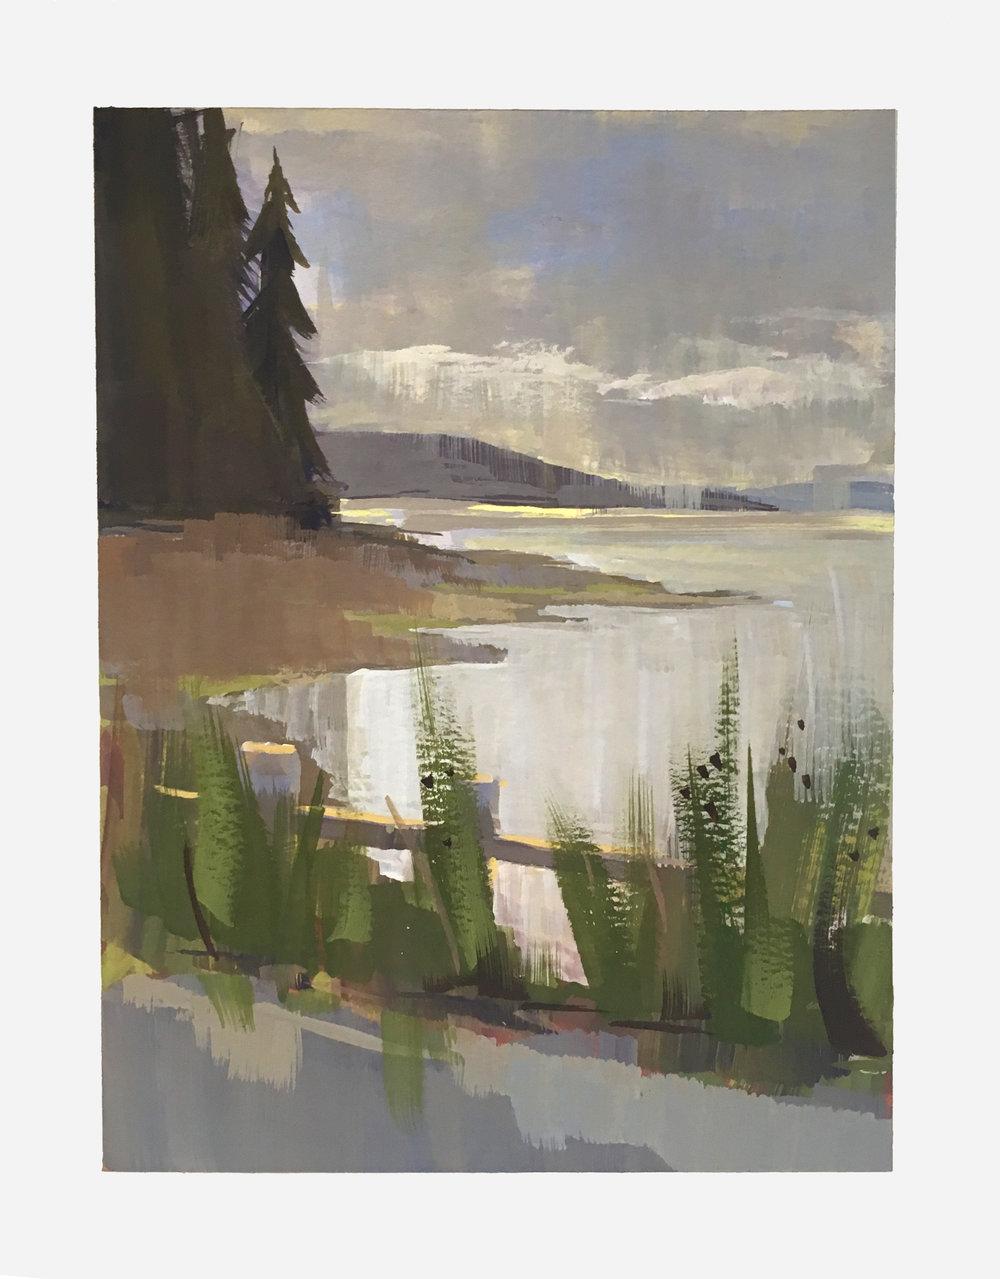 Plein Air, Whidbey Island, WA  Gouache on Paper  6x8